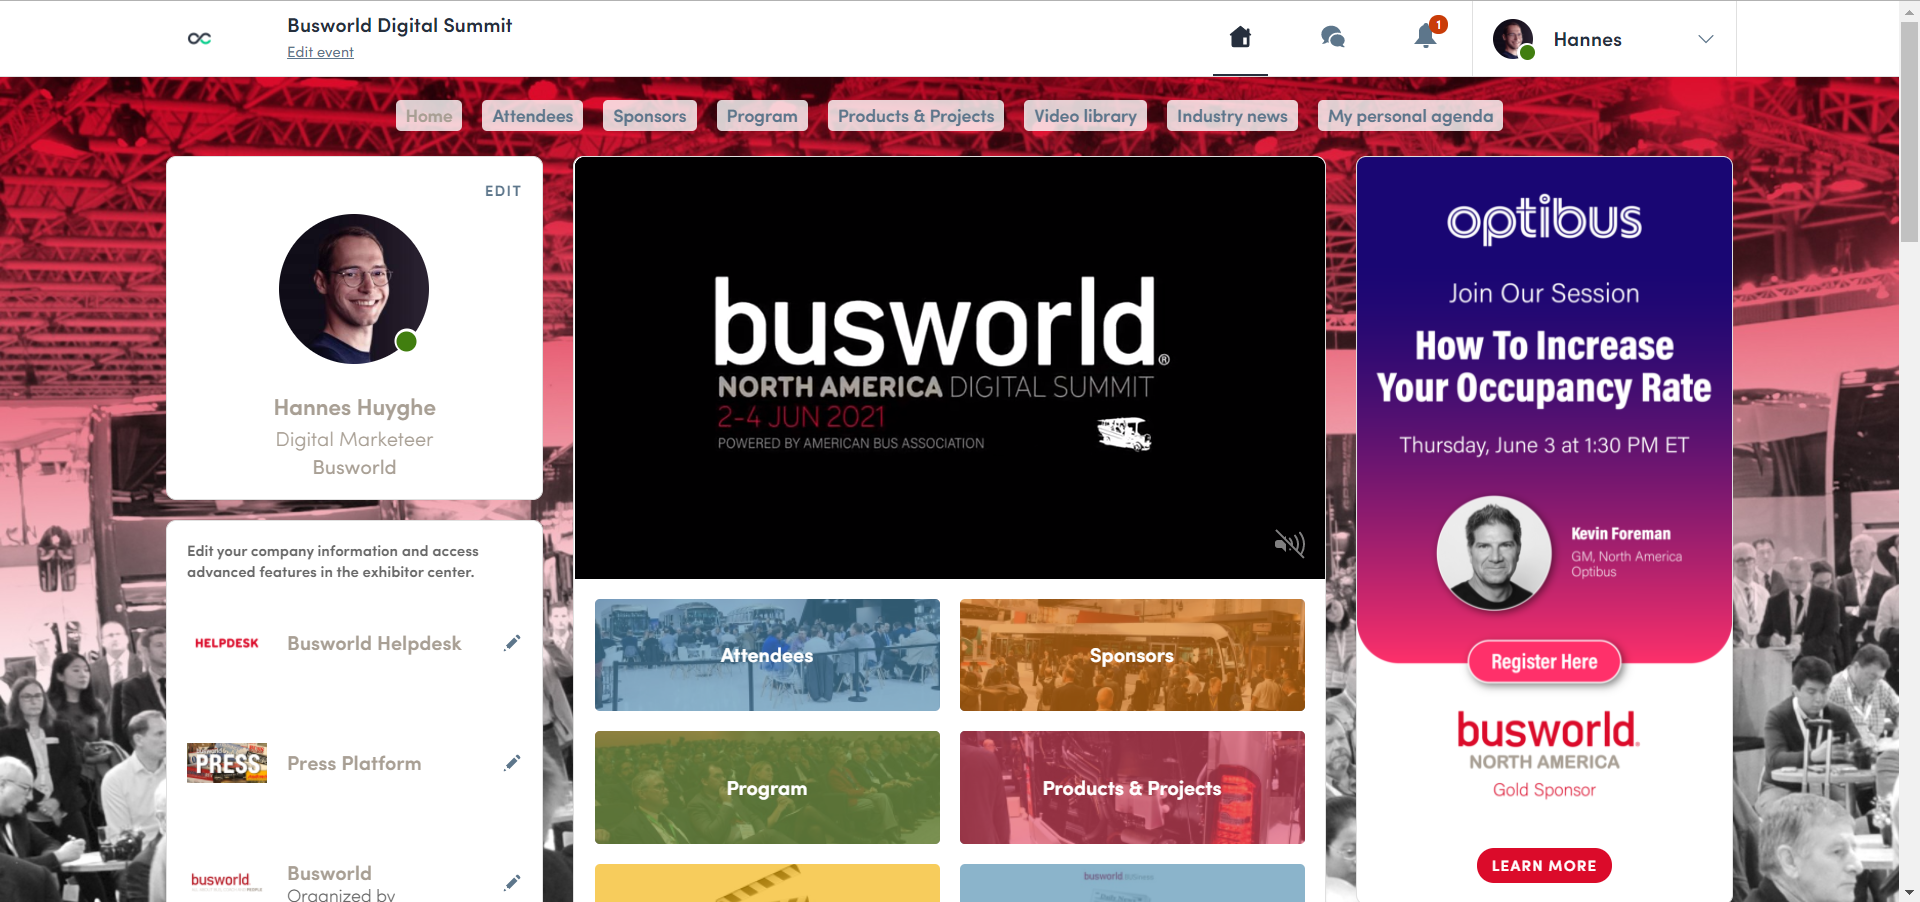 Busworld Digital Summit event platform home